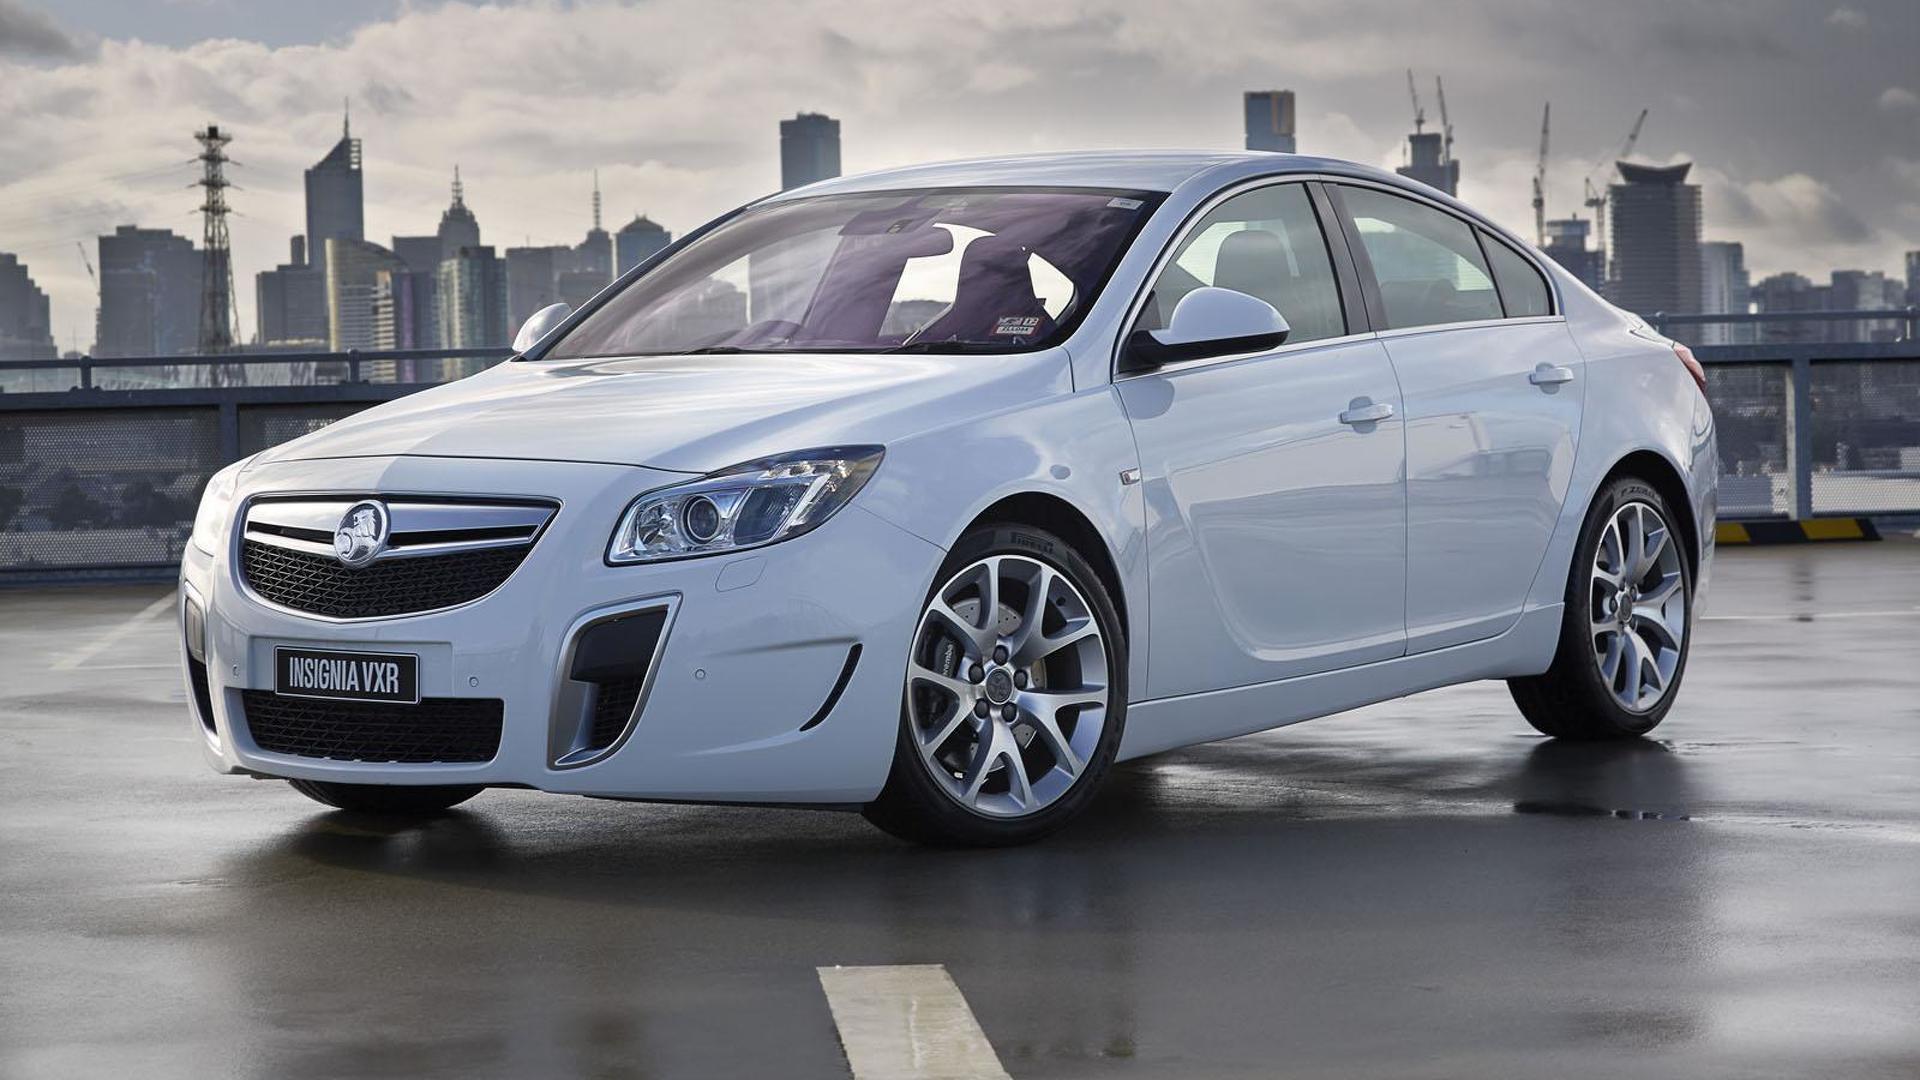 Holden Insignia VXR gets detailed